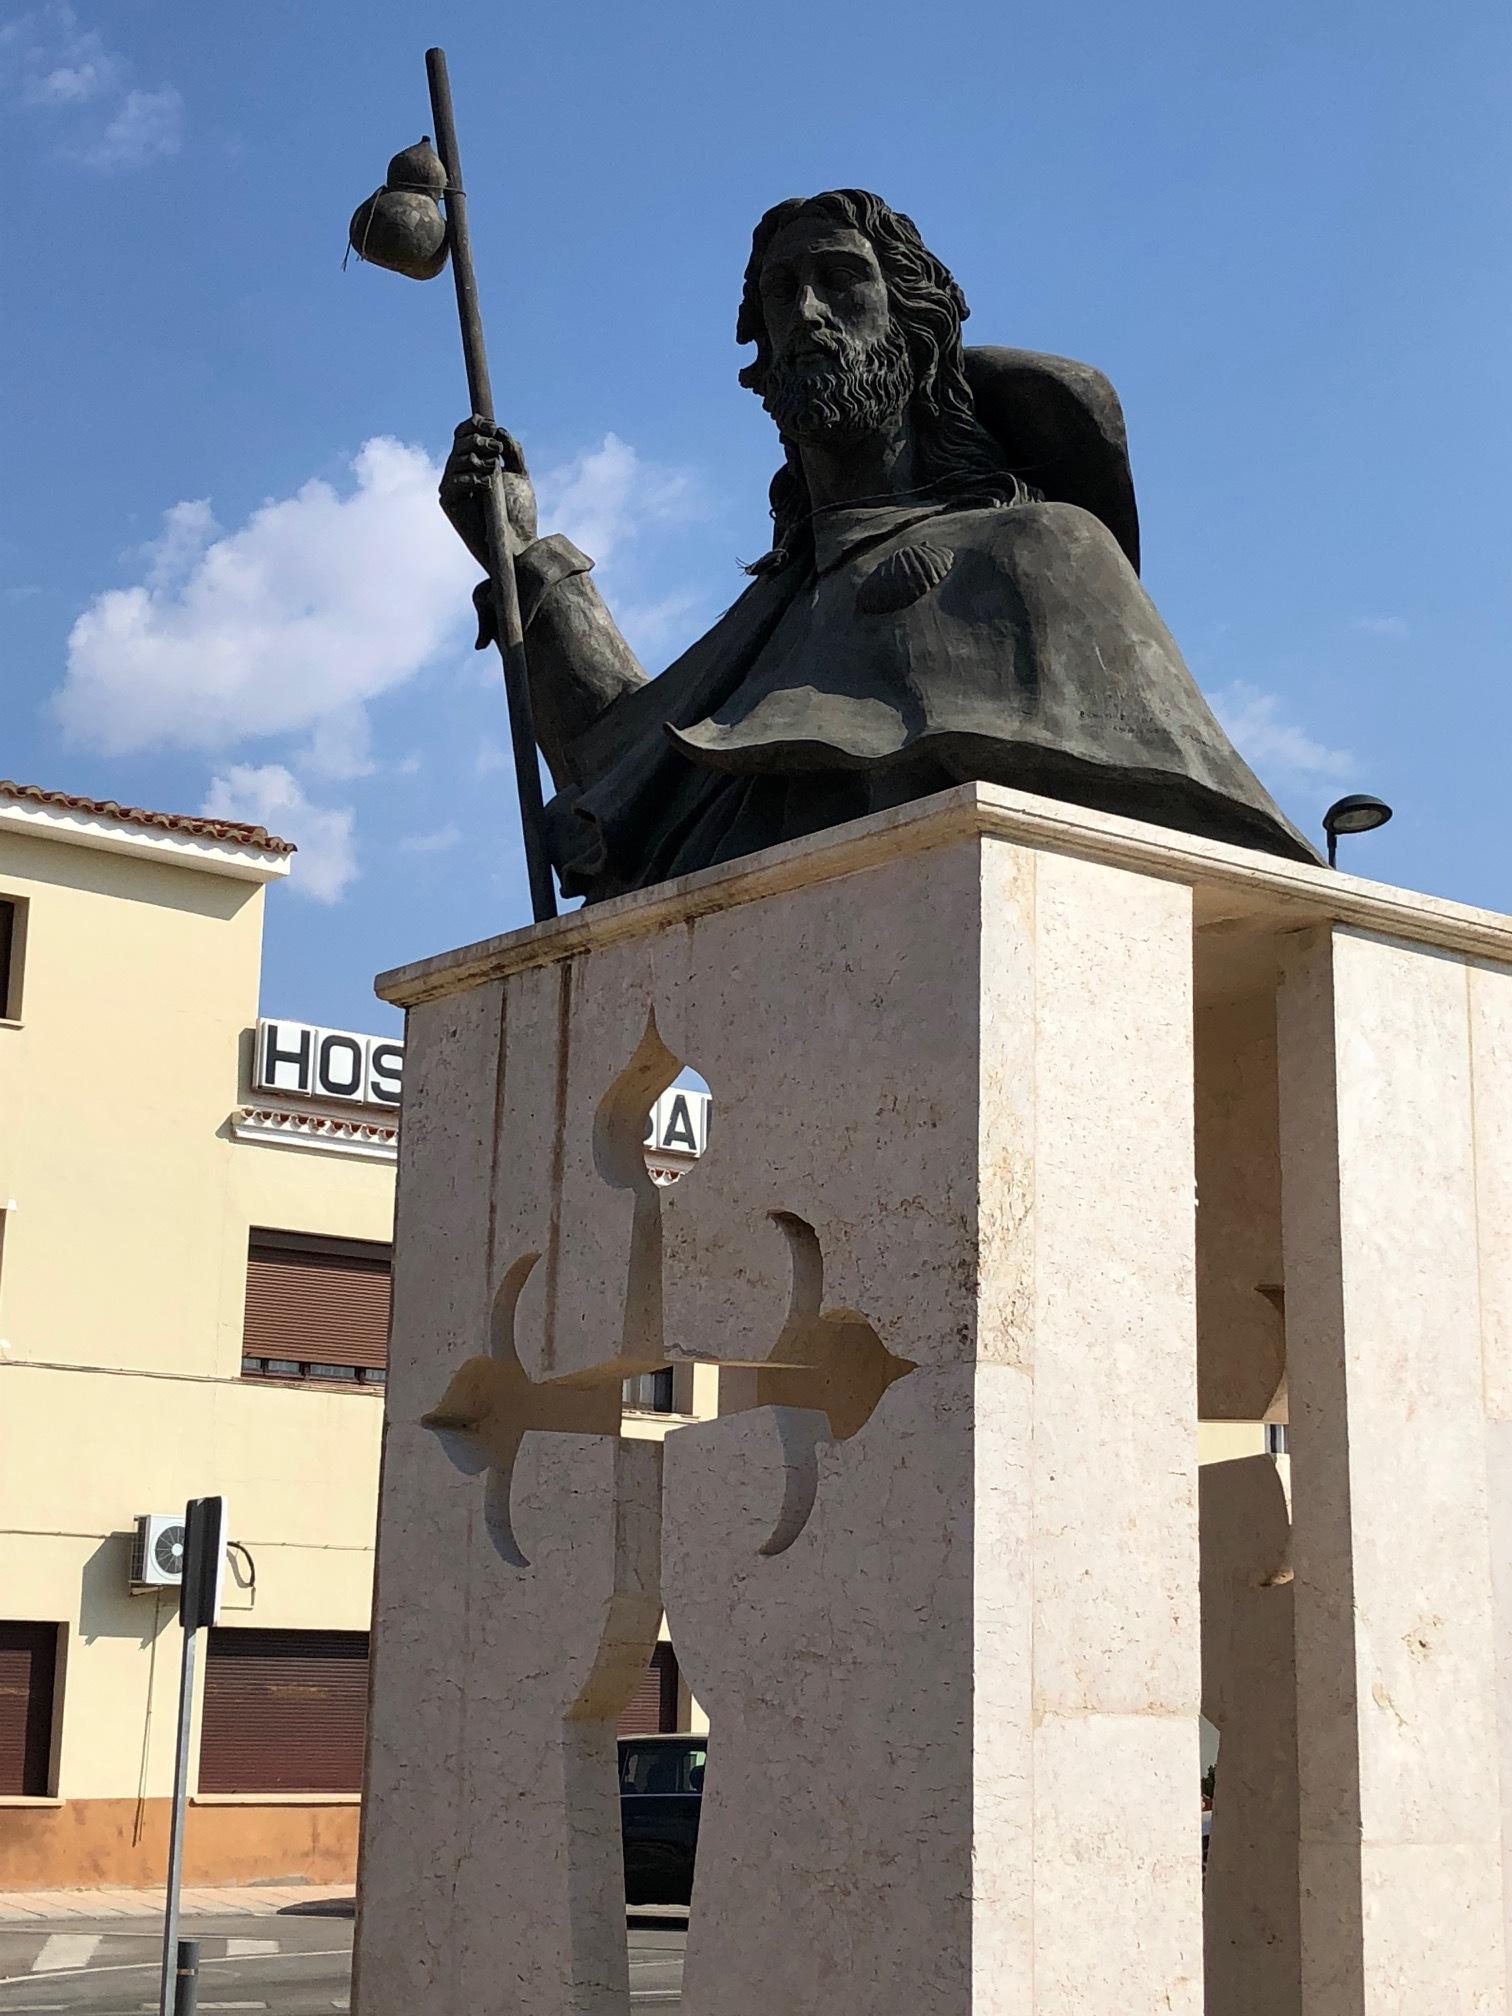 SANTIAGO STATUE AT THE ENTRANCE OF QUINTANAR DE LA ORDEN